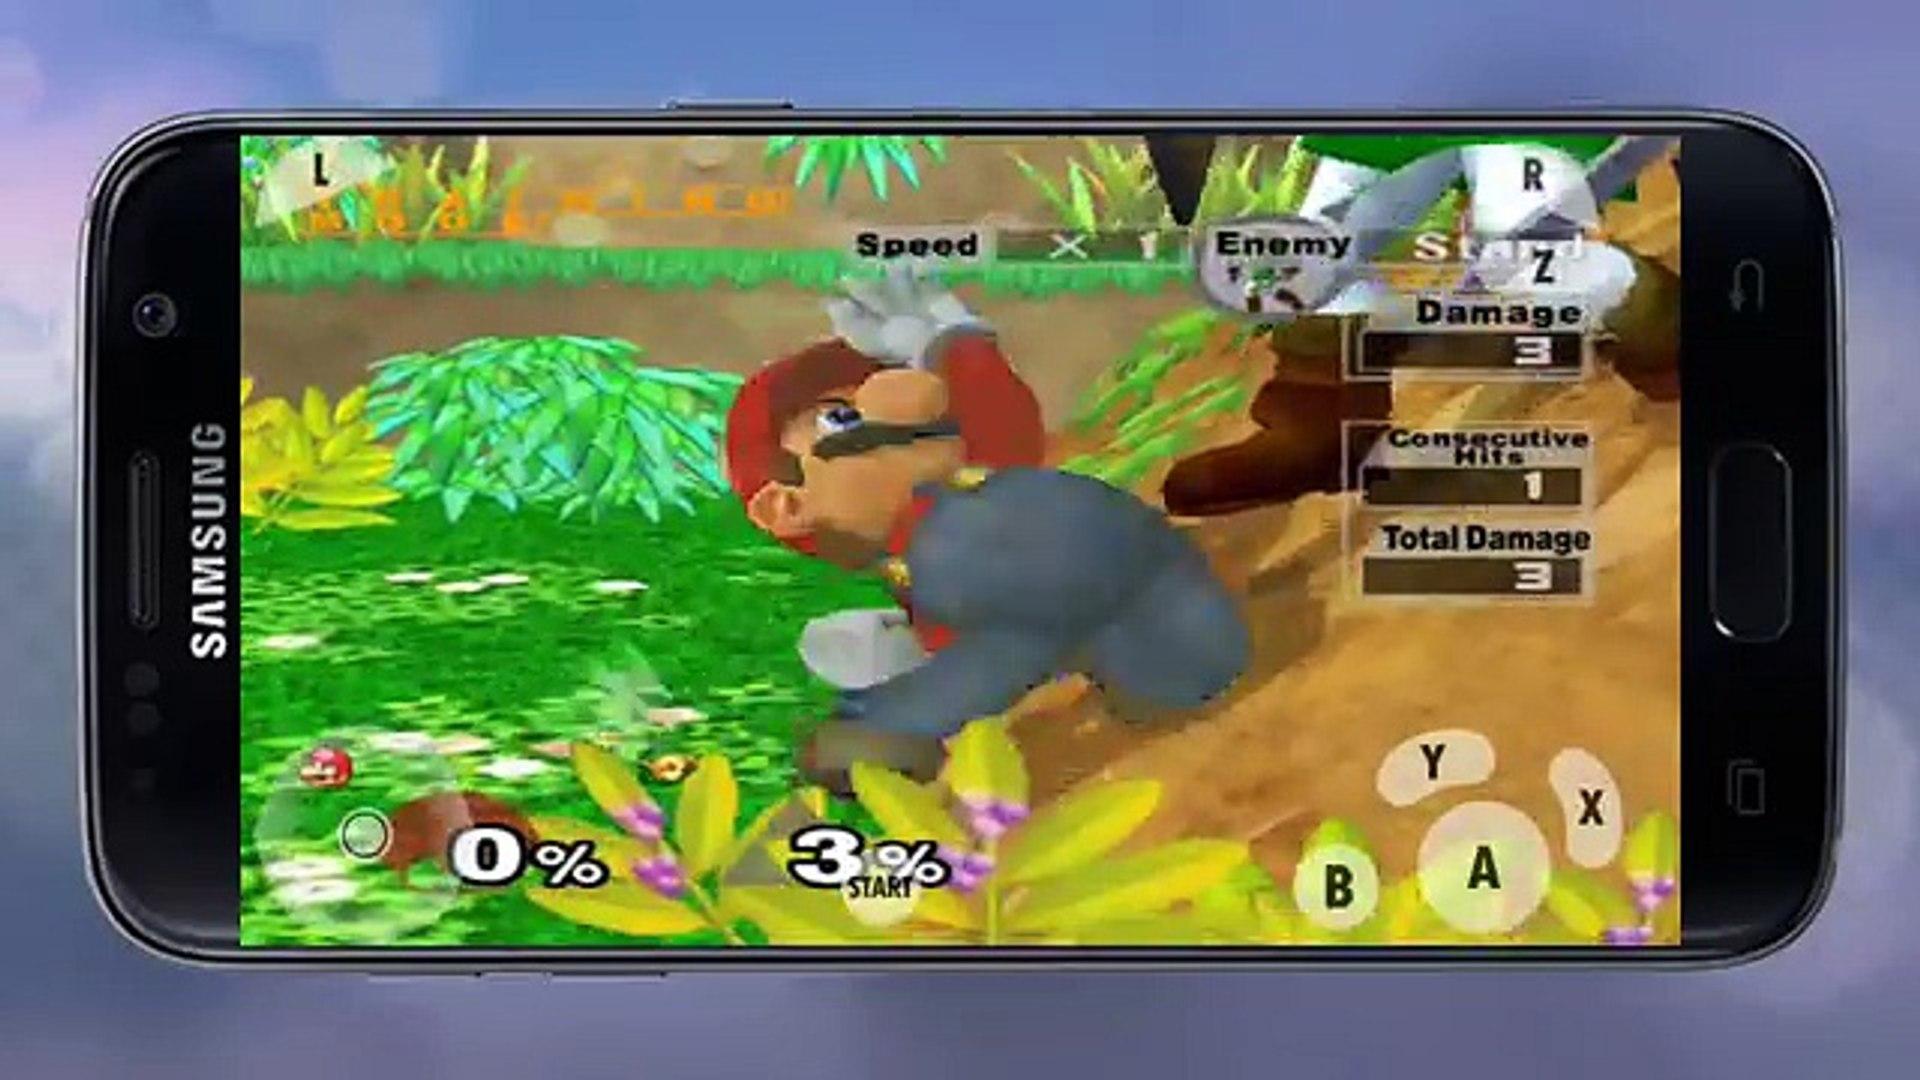 Super Smash Bros  Melee on Galaxy S7 (Dolphin Emulator)